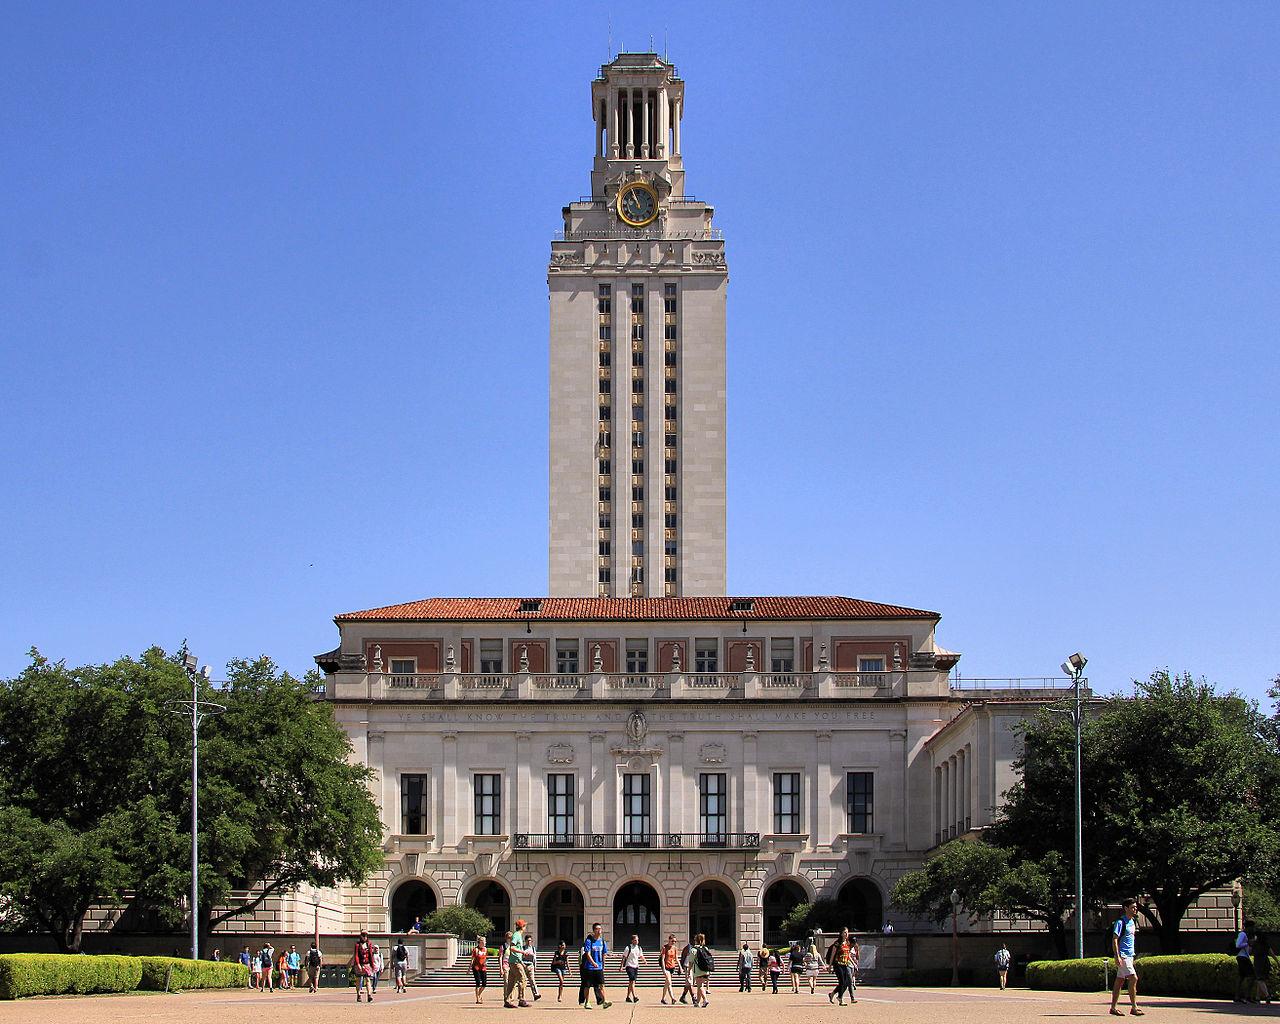 The University of Texas, Austin